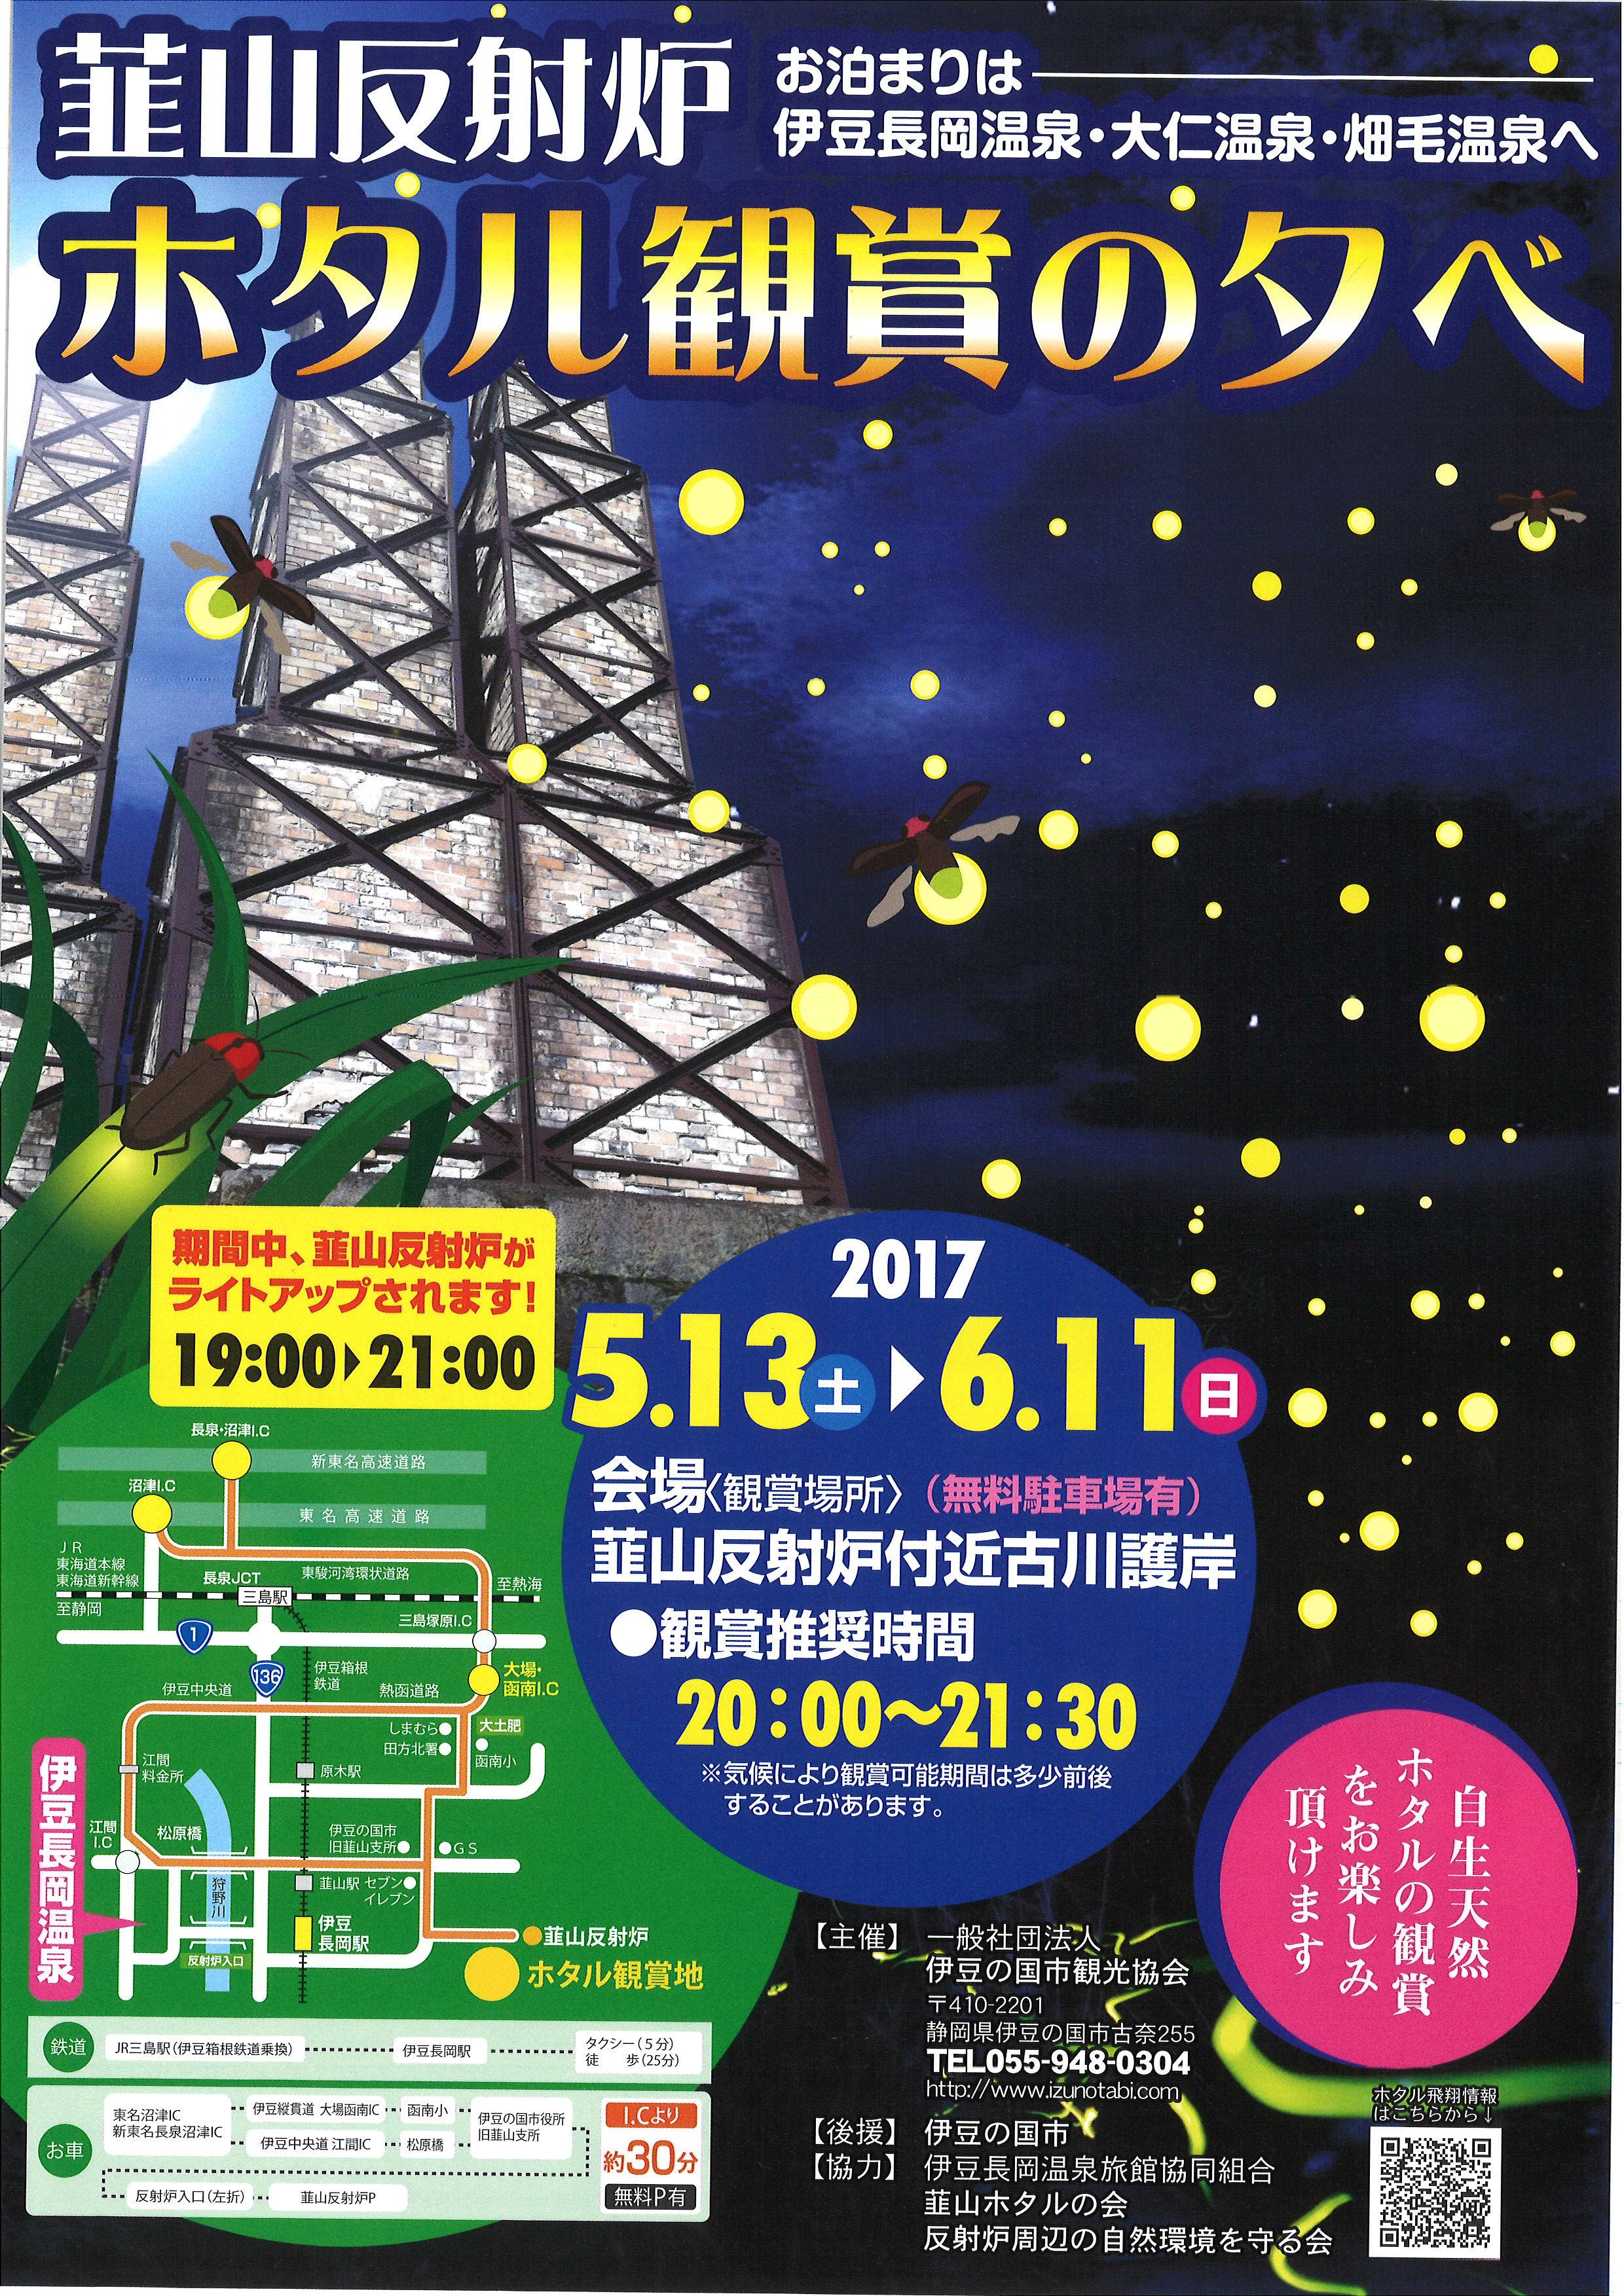 align:none link:0 alt:0 ホタル観賞の夕べ 韮山反射炉で5/13~6/11開催!l